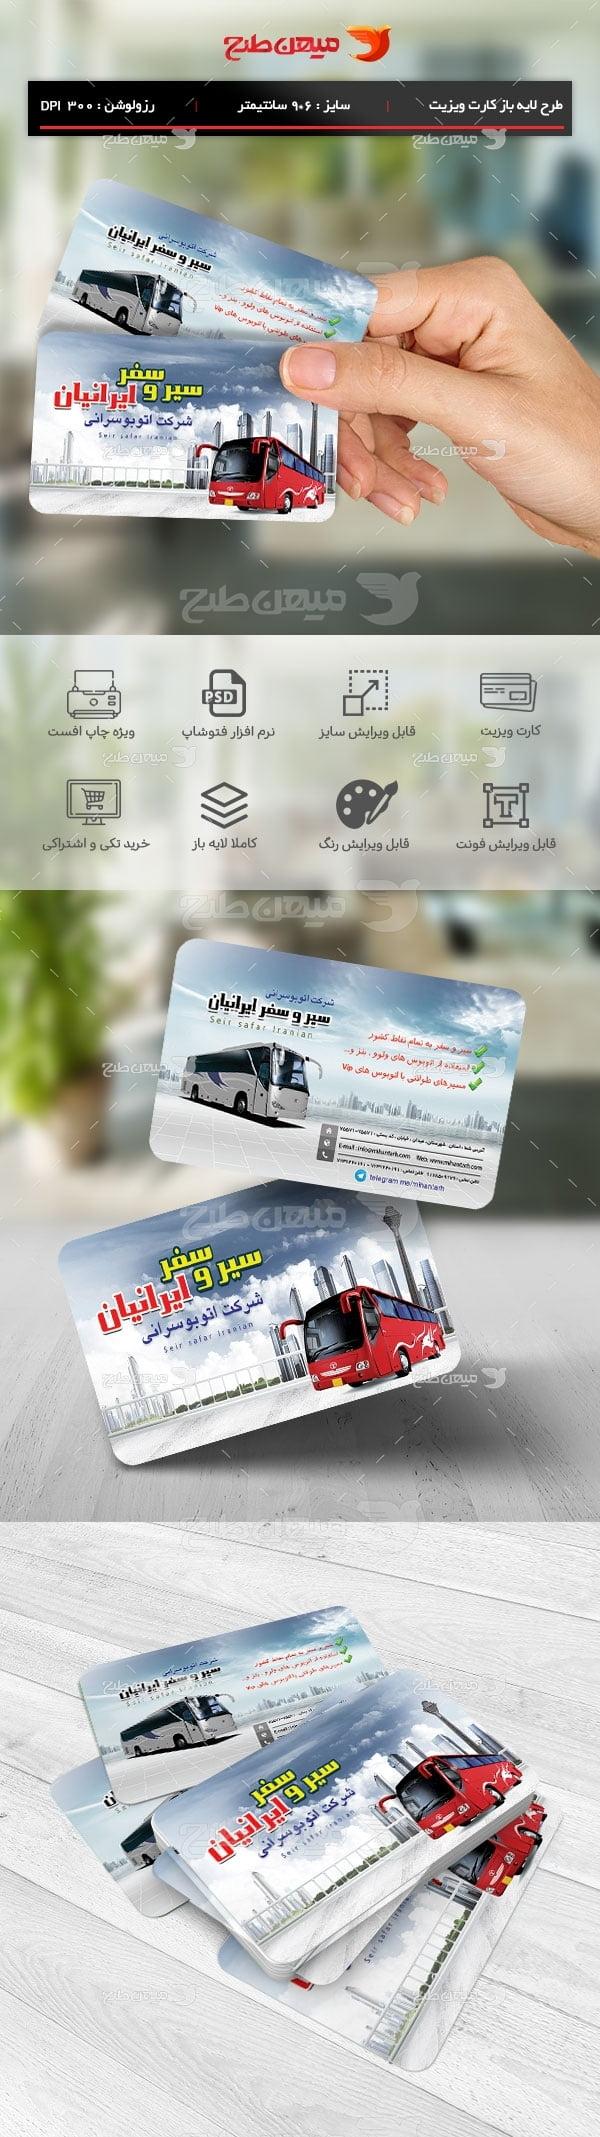 طرح کارت ویزیت شرکت اتوبوسرانی 06